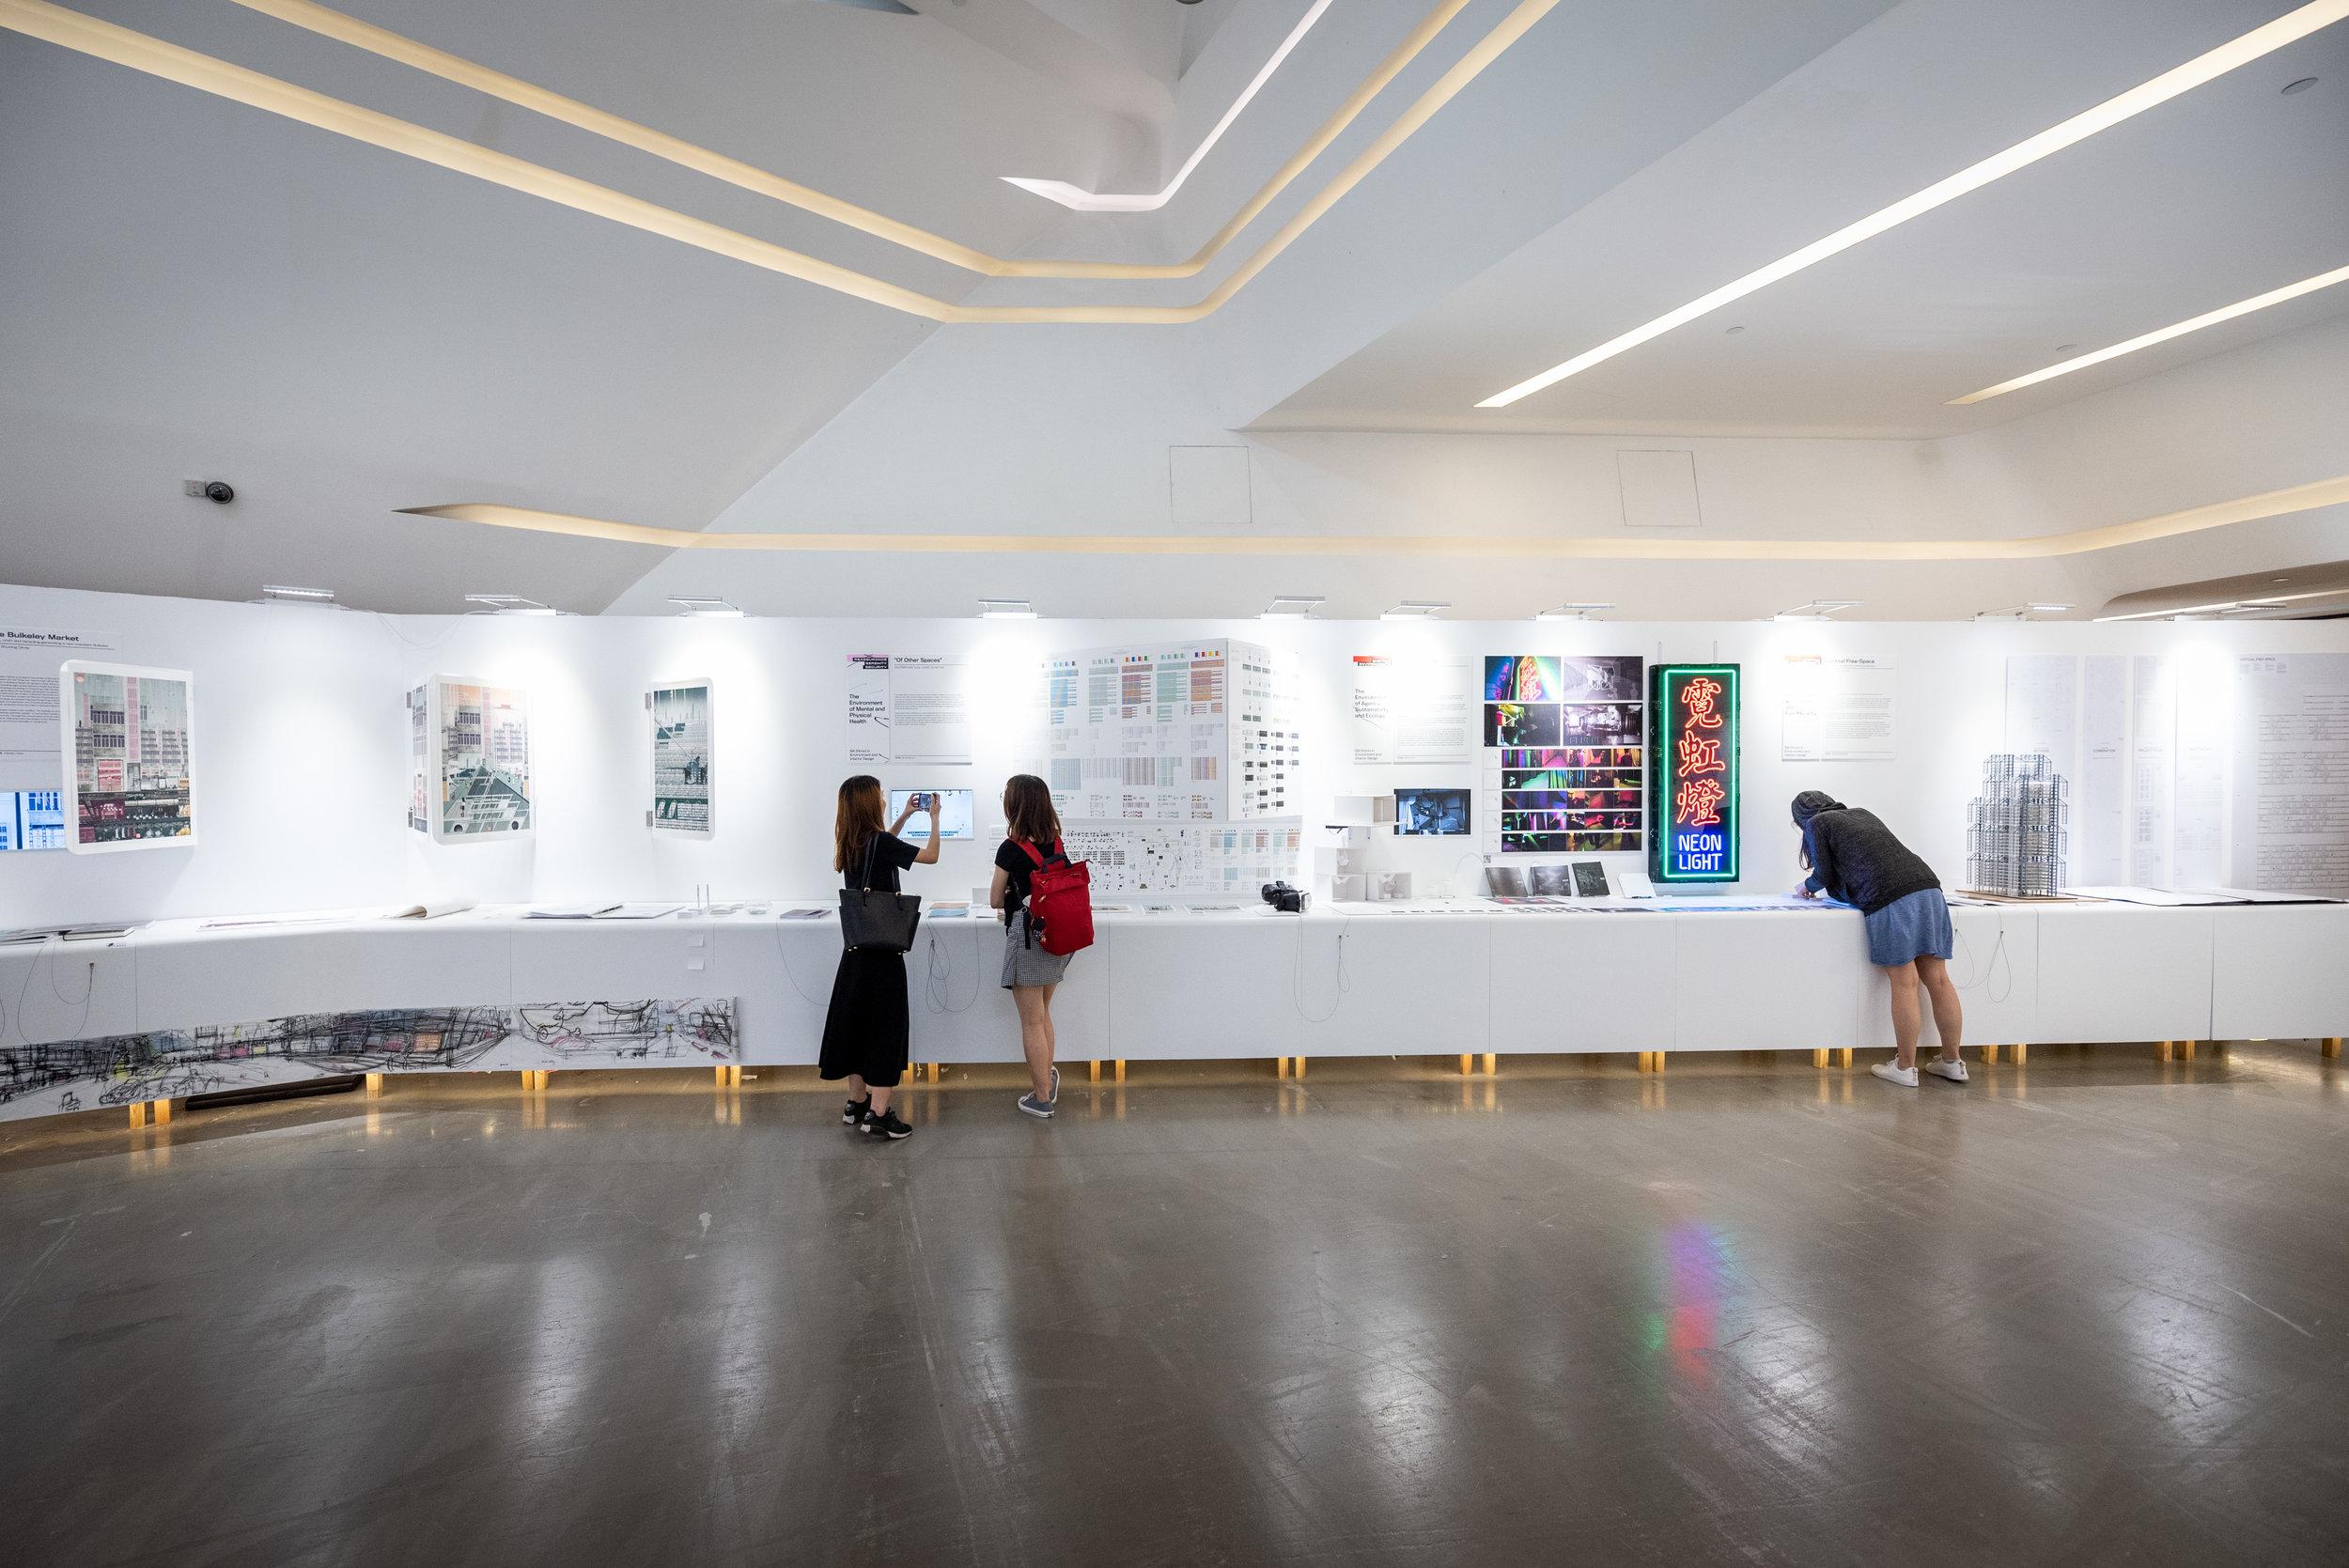 20190619 Poly U design school opening (31 of 219).jpg